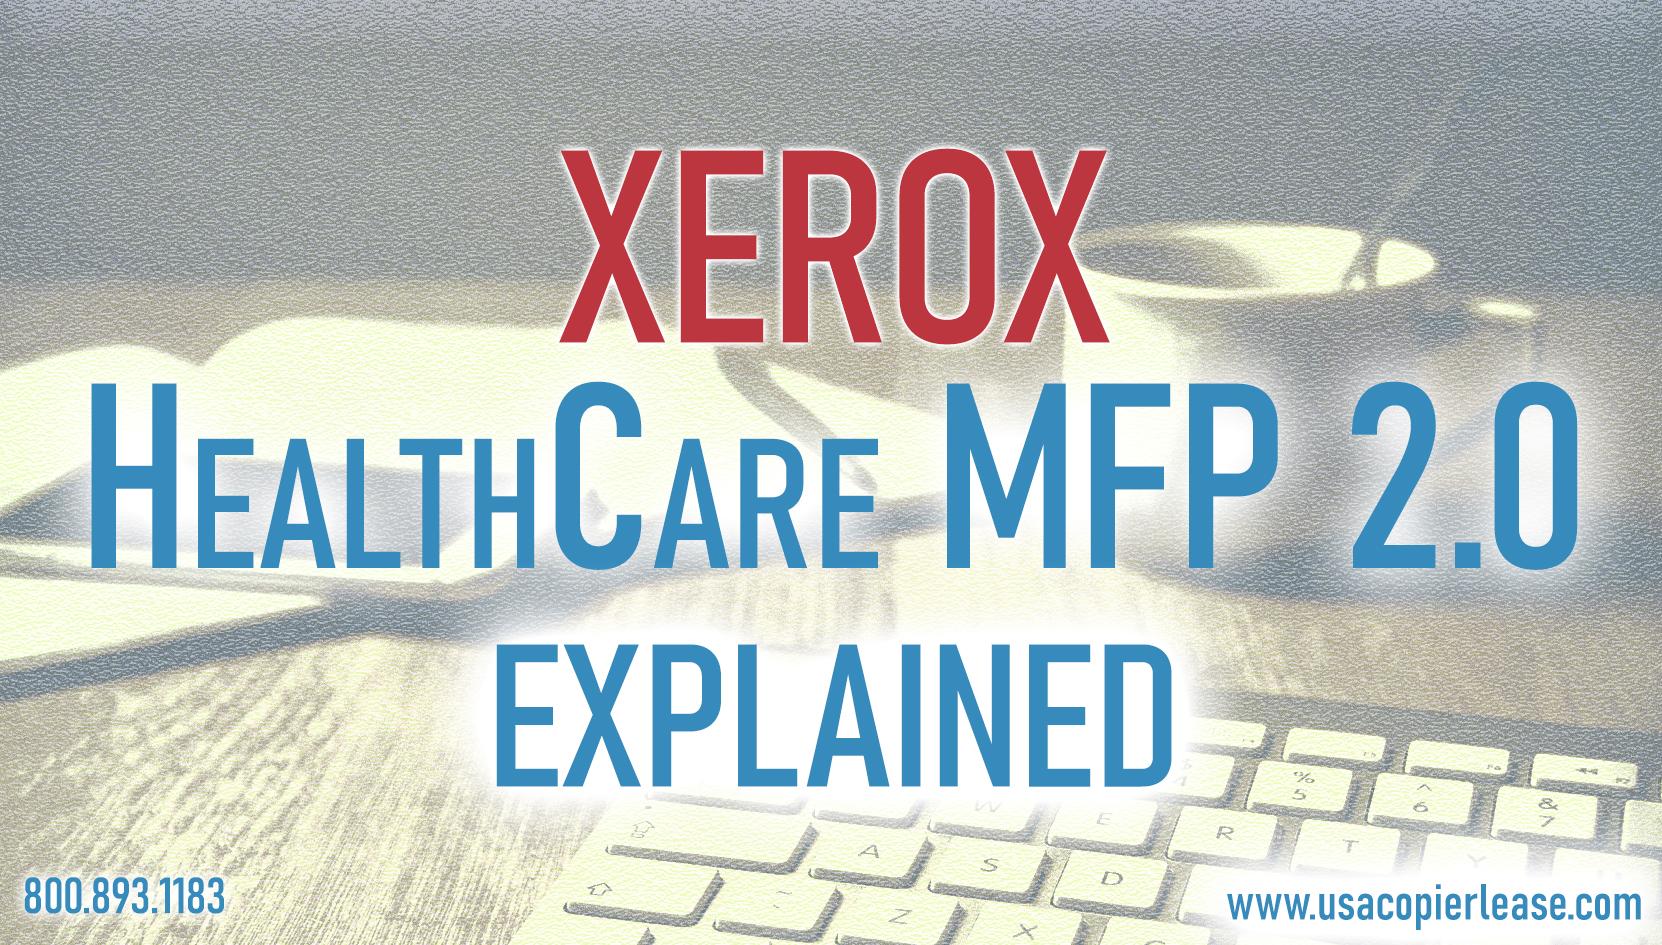 Xerox – Healthcare MFP 2.0 Explained